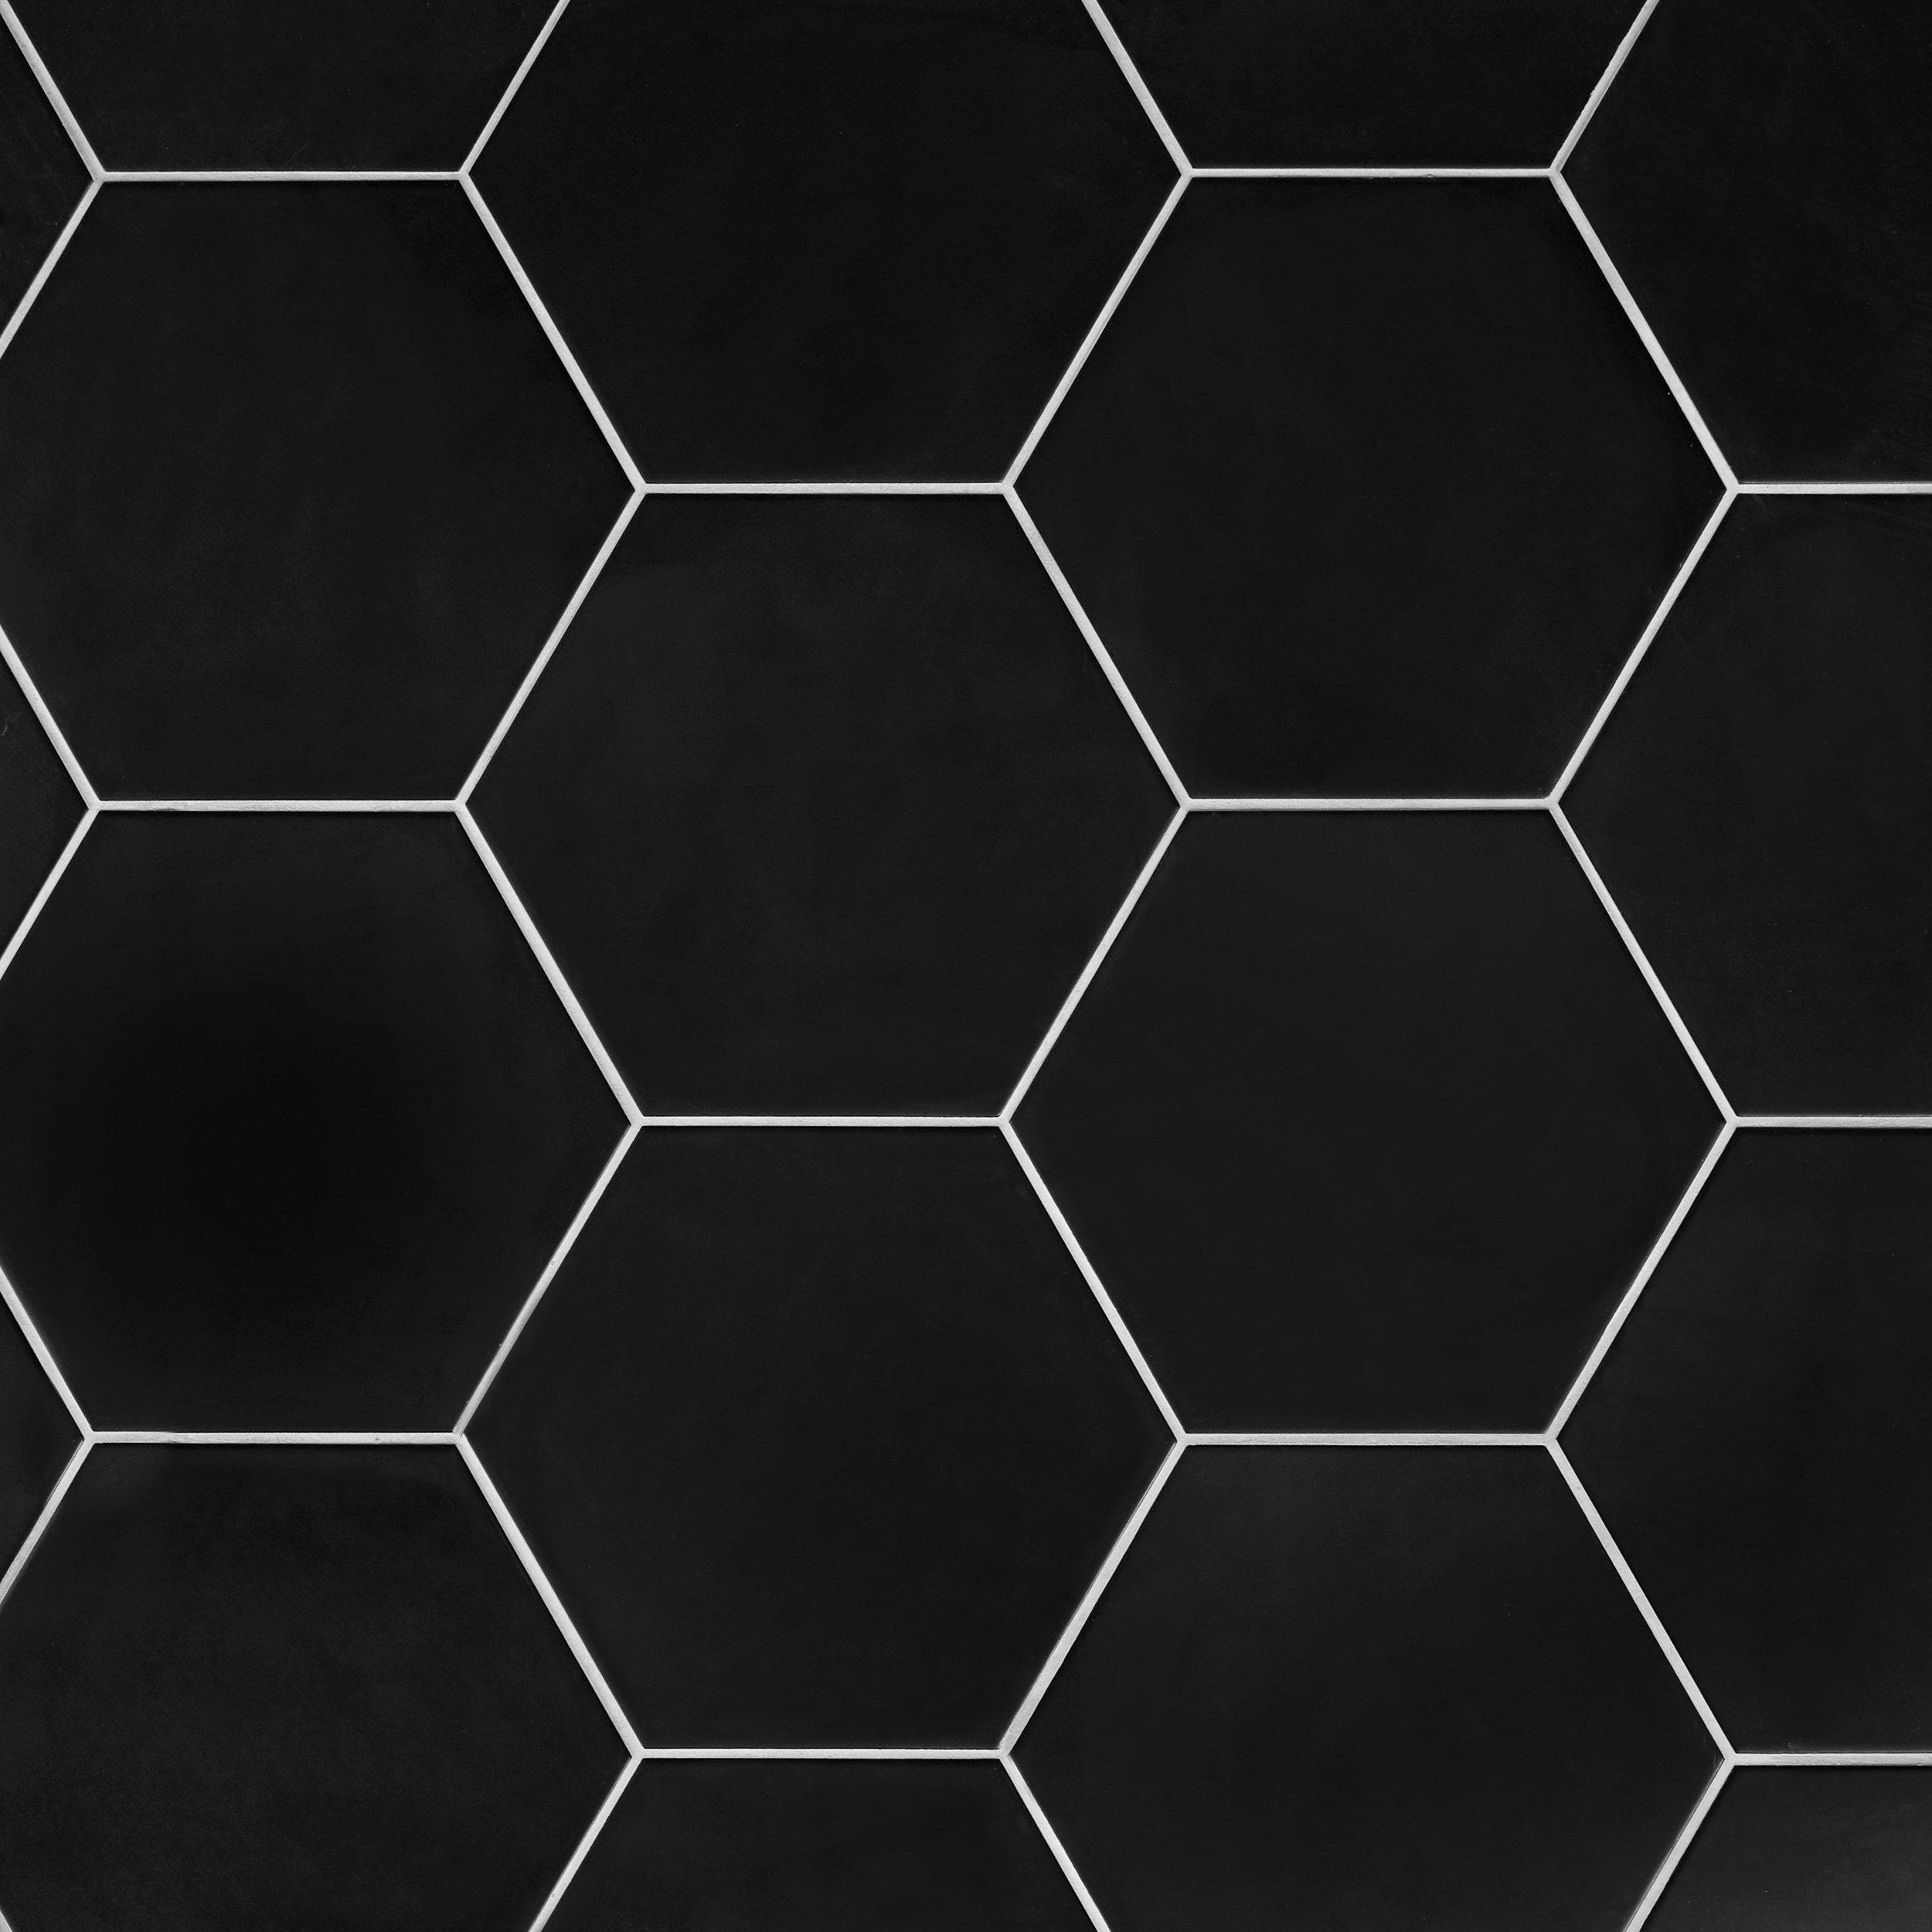 Opal Black Hexagon Porcelain Tile